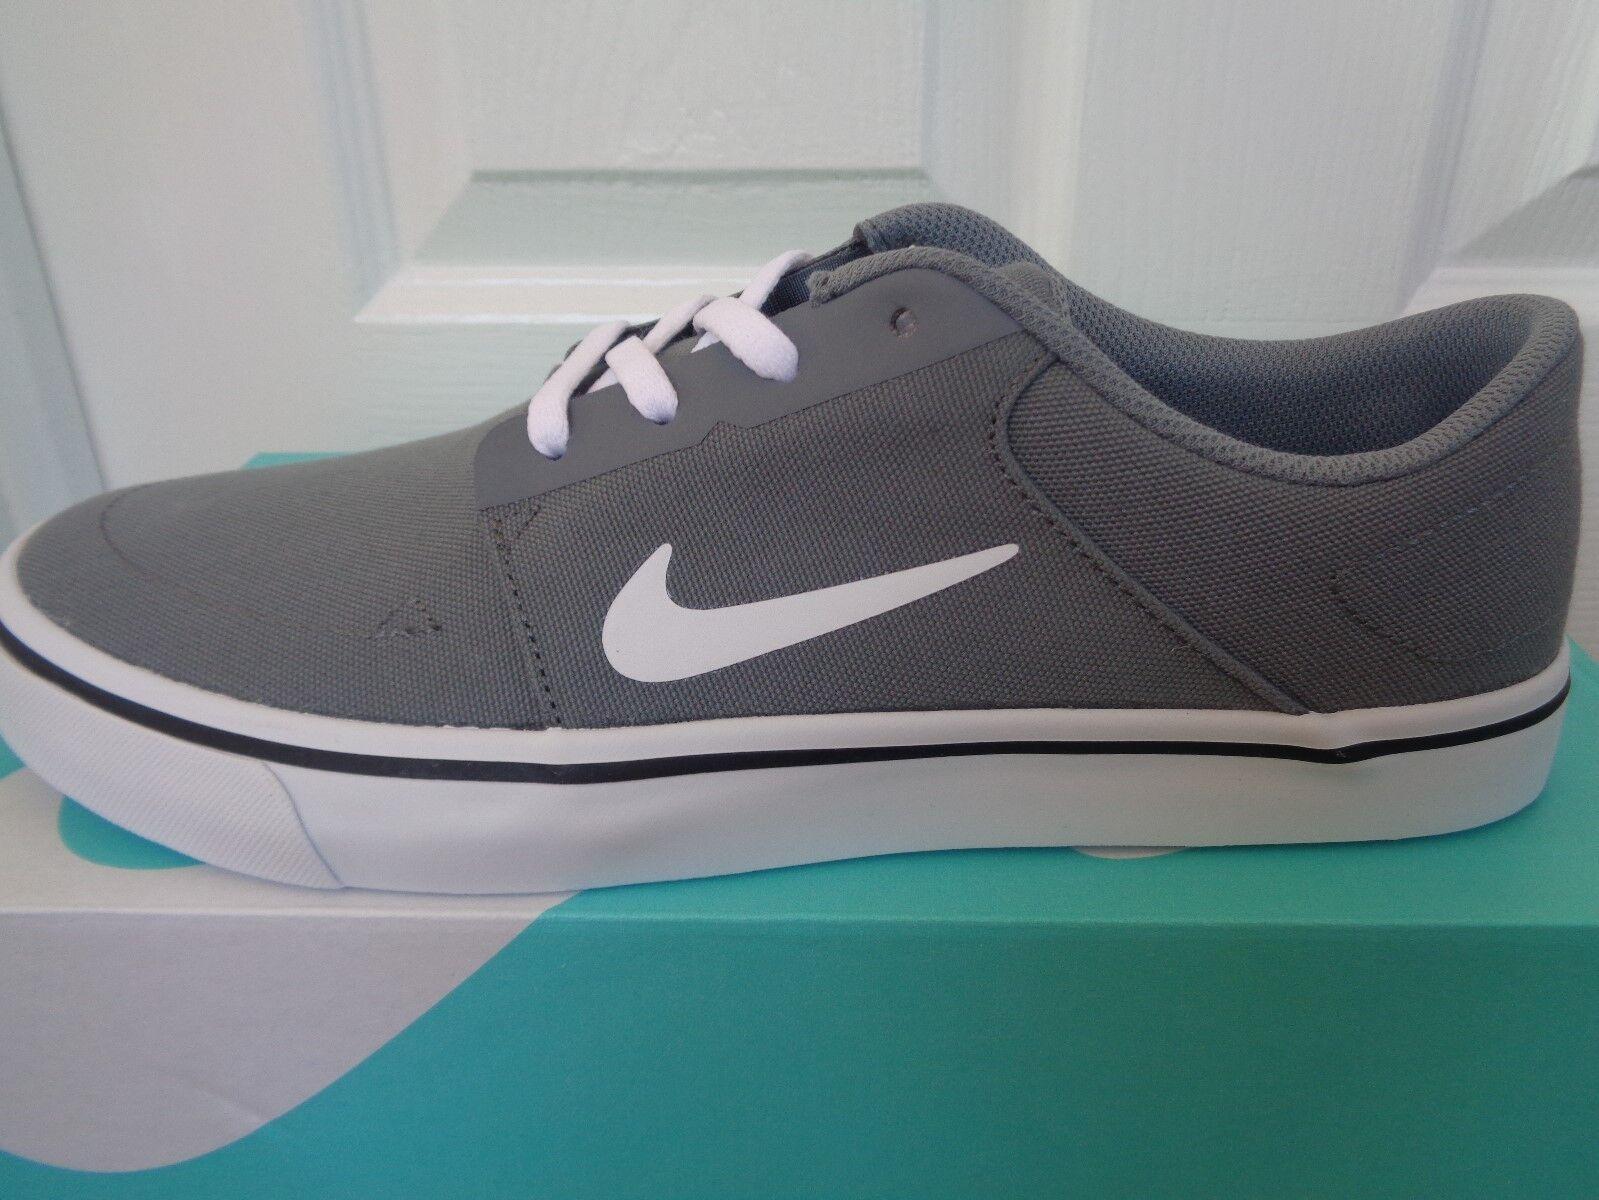 Nike SB Portmore CNVS Canvas Grey White Mens Skateboarding Shoes ... be0e7a00f